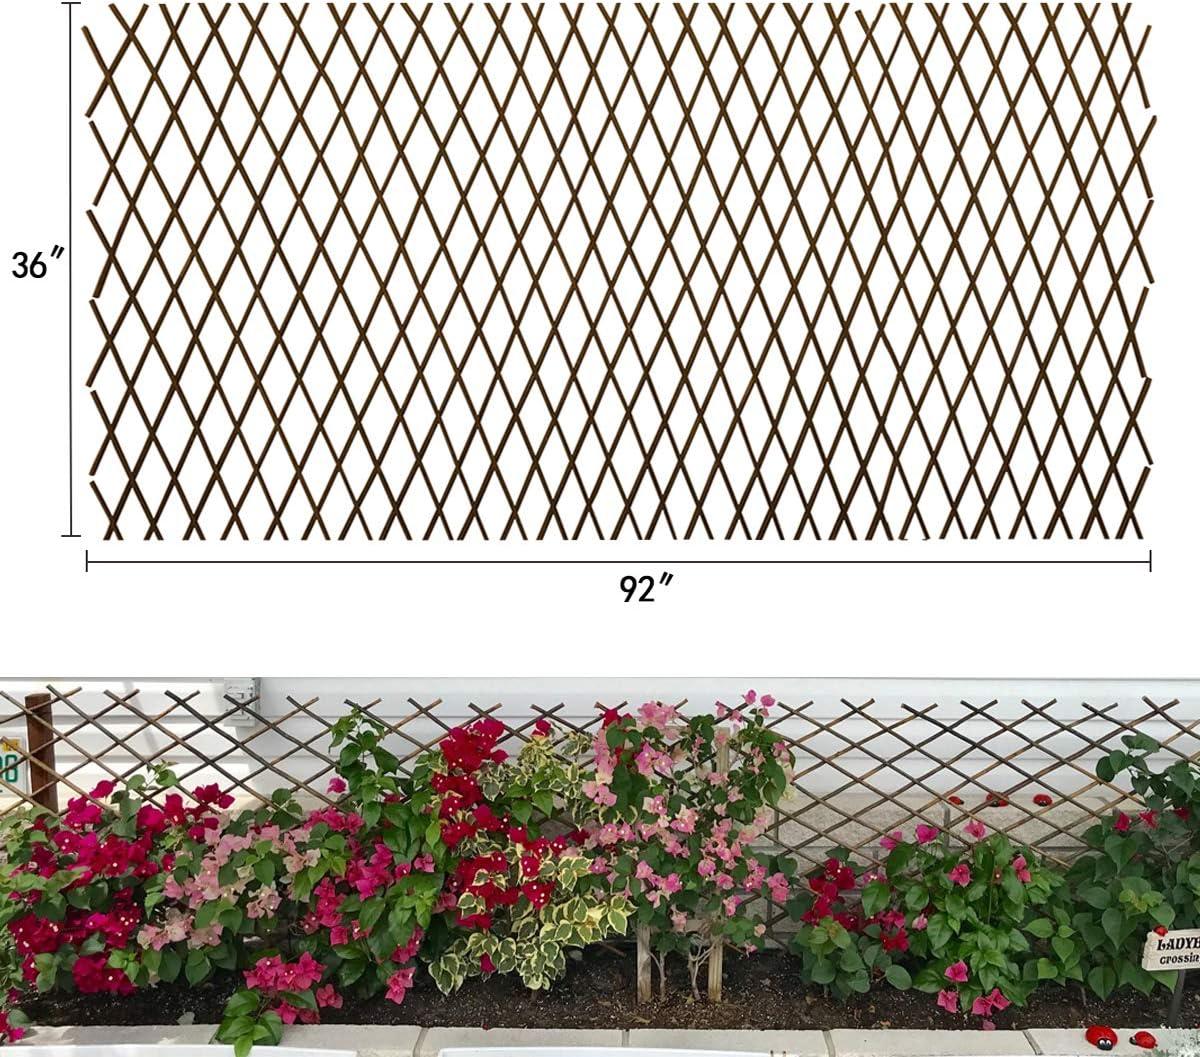 Expandable Garden Trellis Plant Support Willow Lattice Fence Panel ...